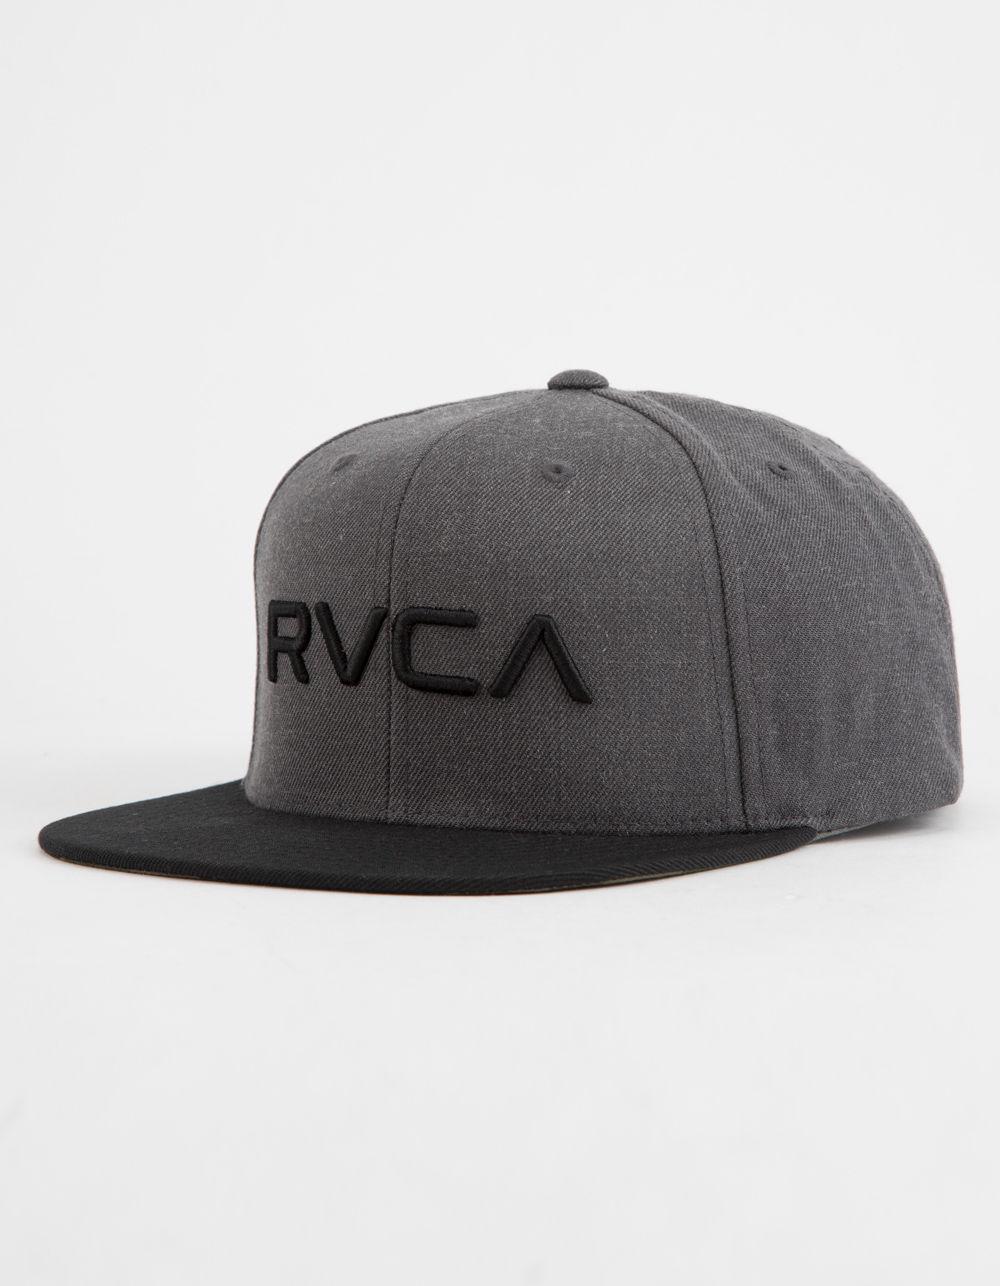 sports shoes 837c4 9d411 RVCA - Gray Twill Ii Charcoal Mens Snapback Hat for Men - Lyst. View  fullscreen